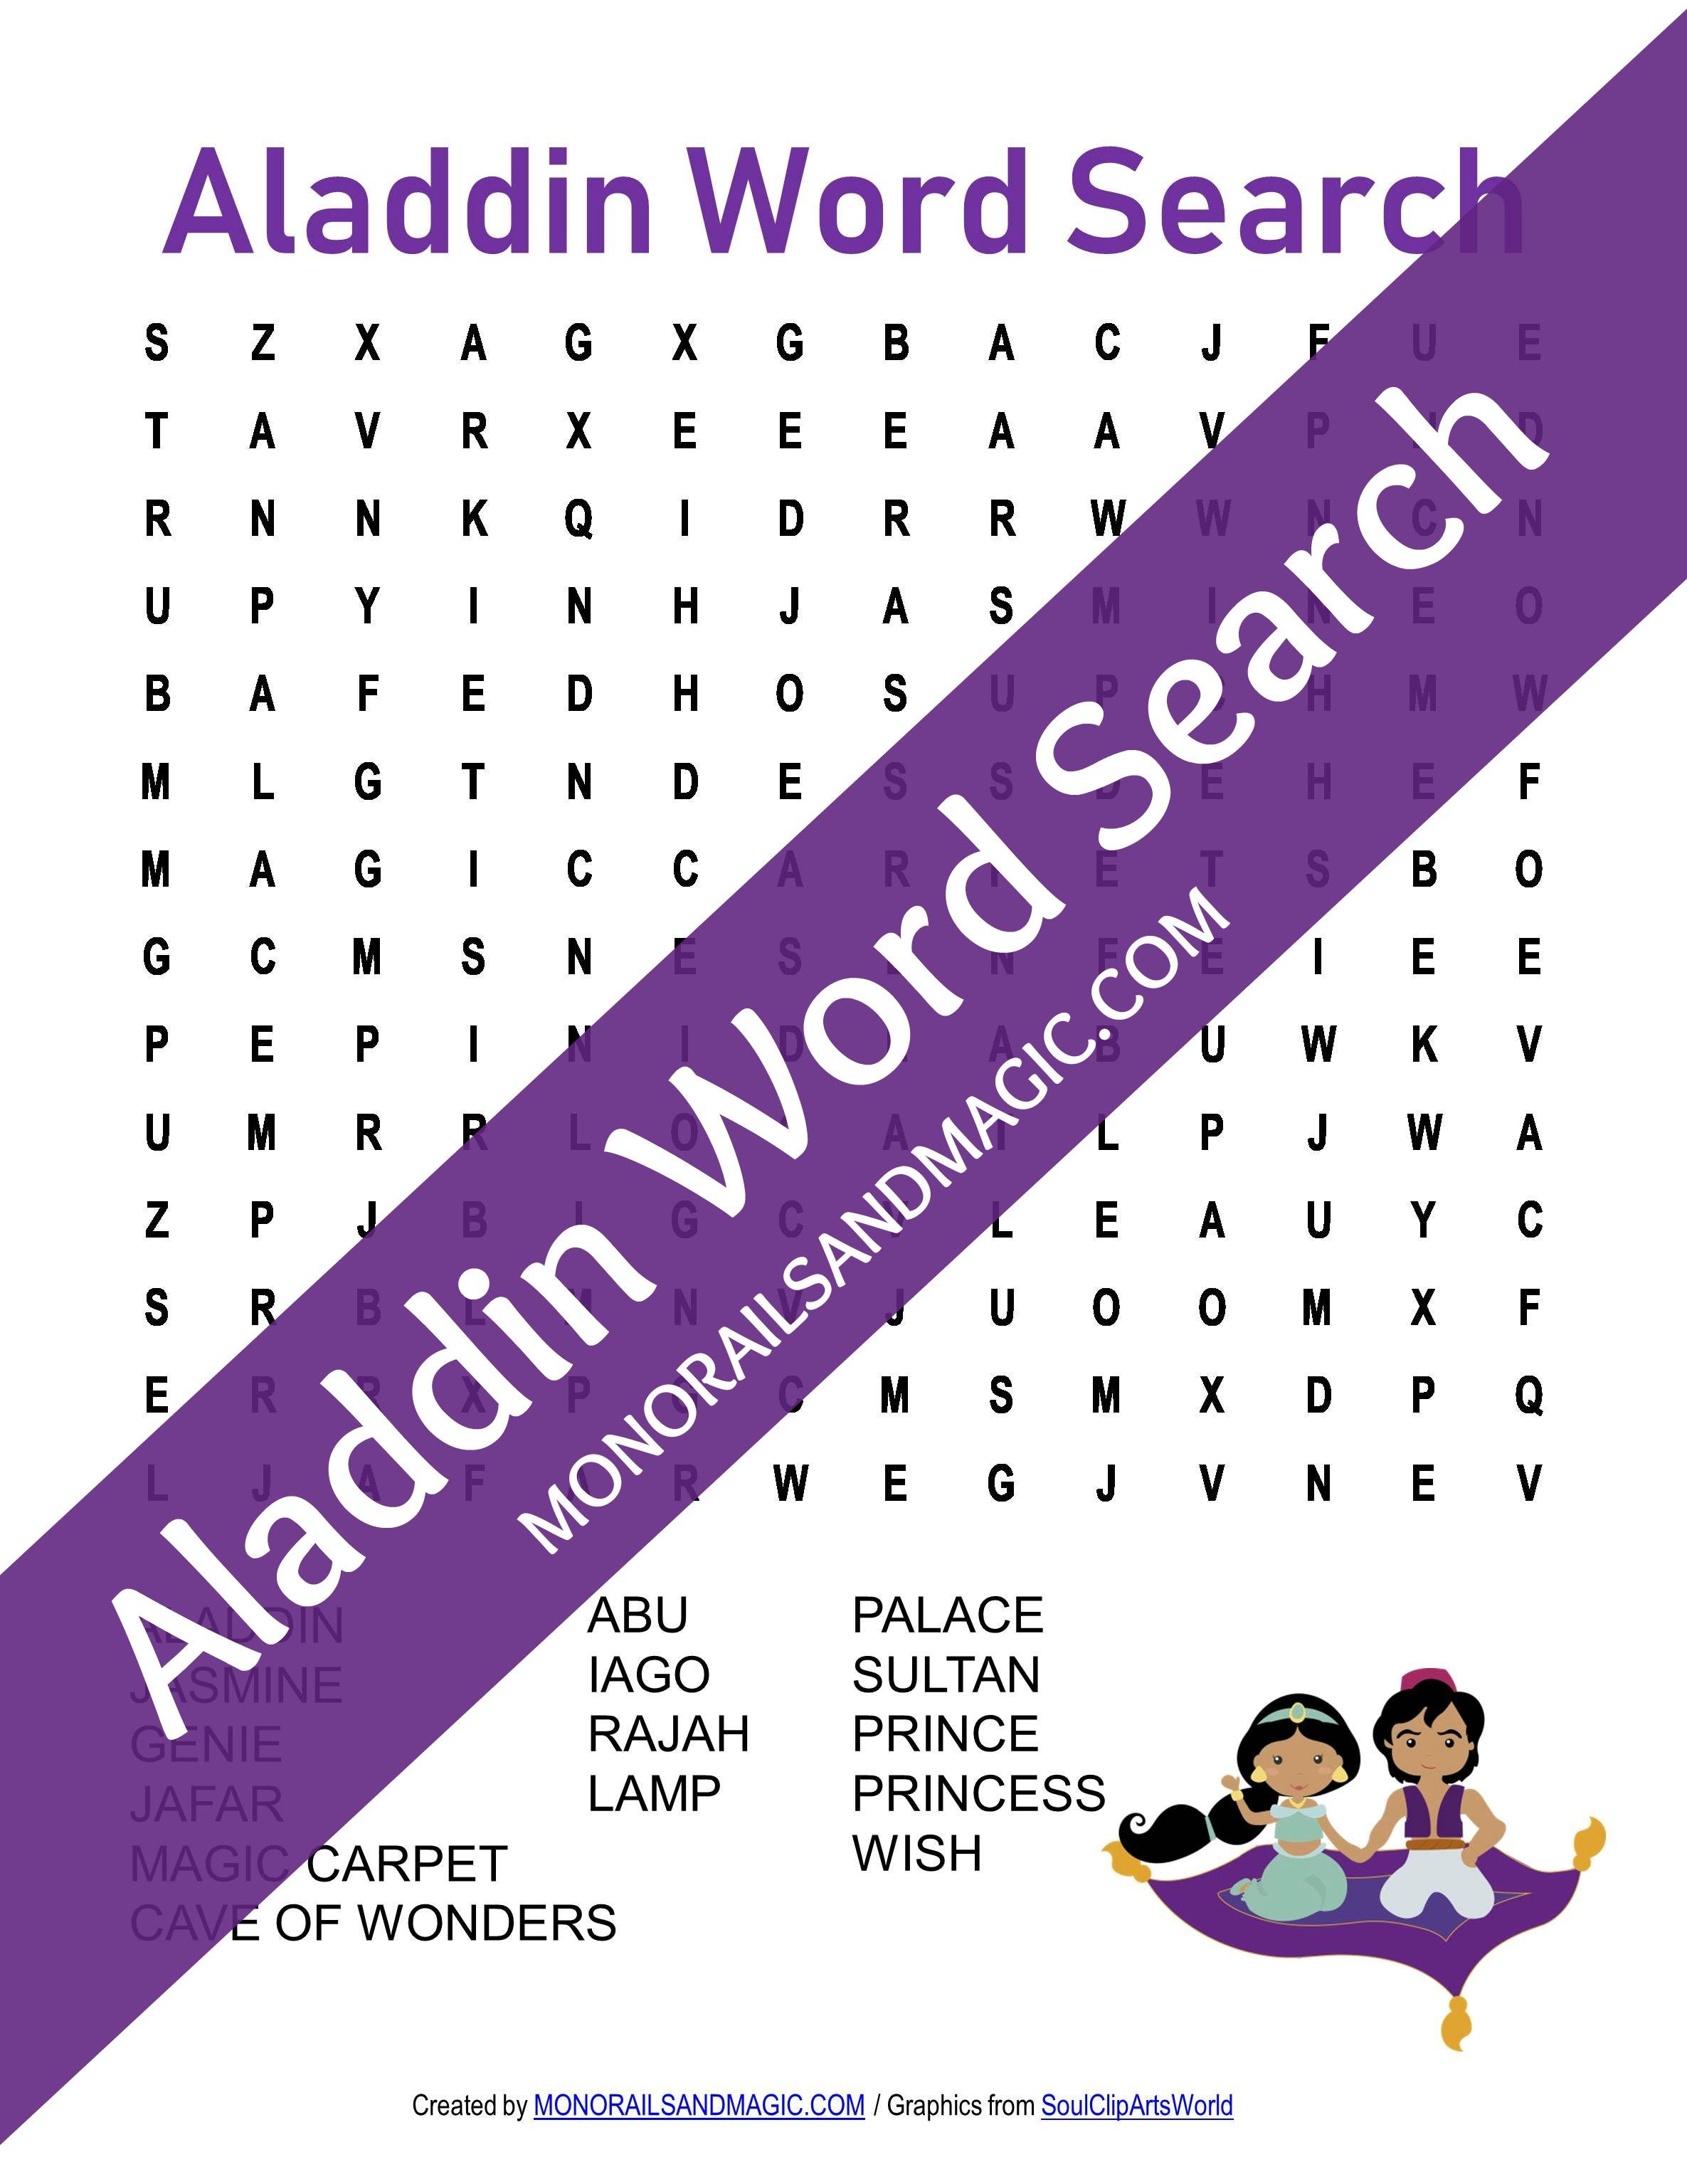 Aladdin Word Search Free Printable